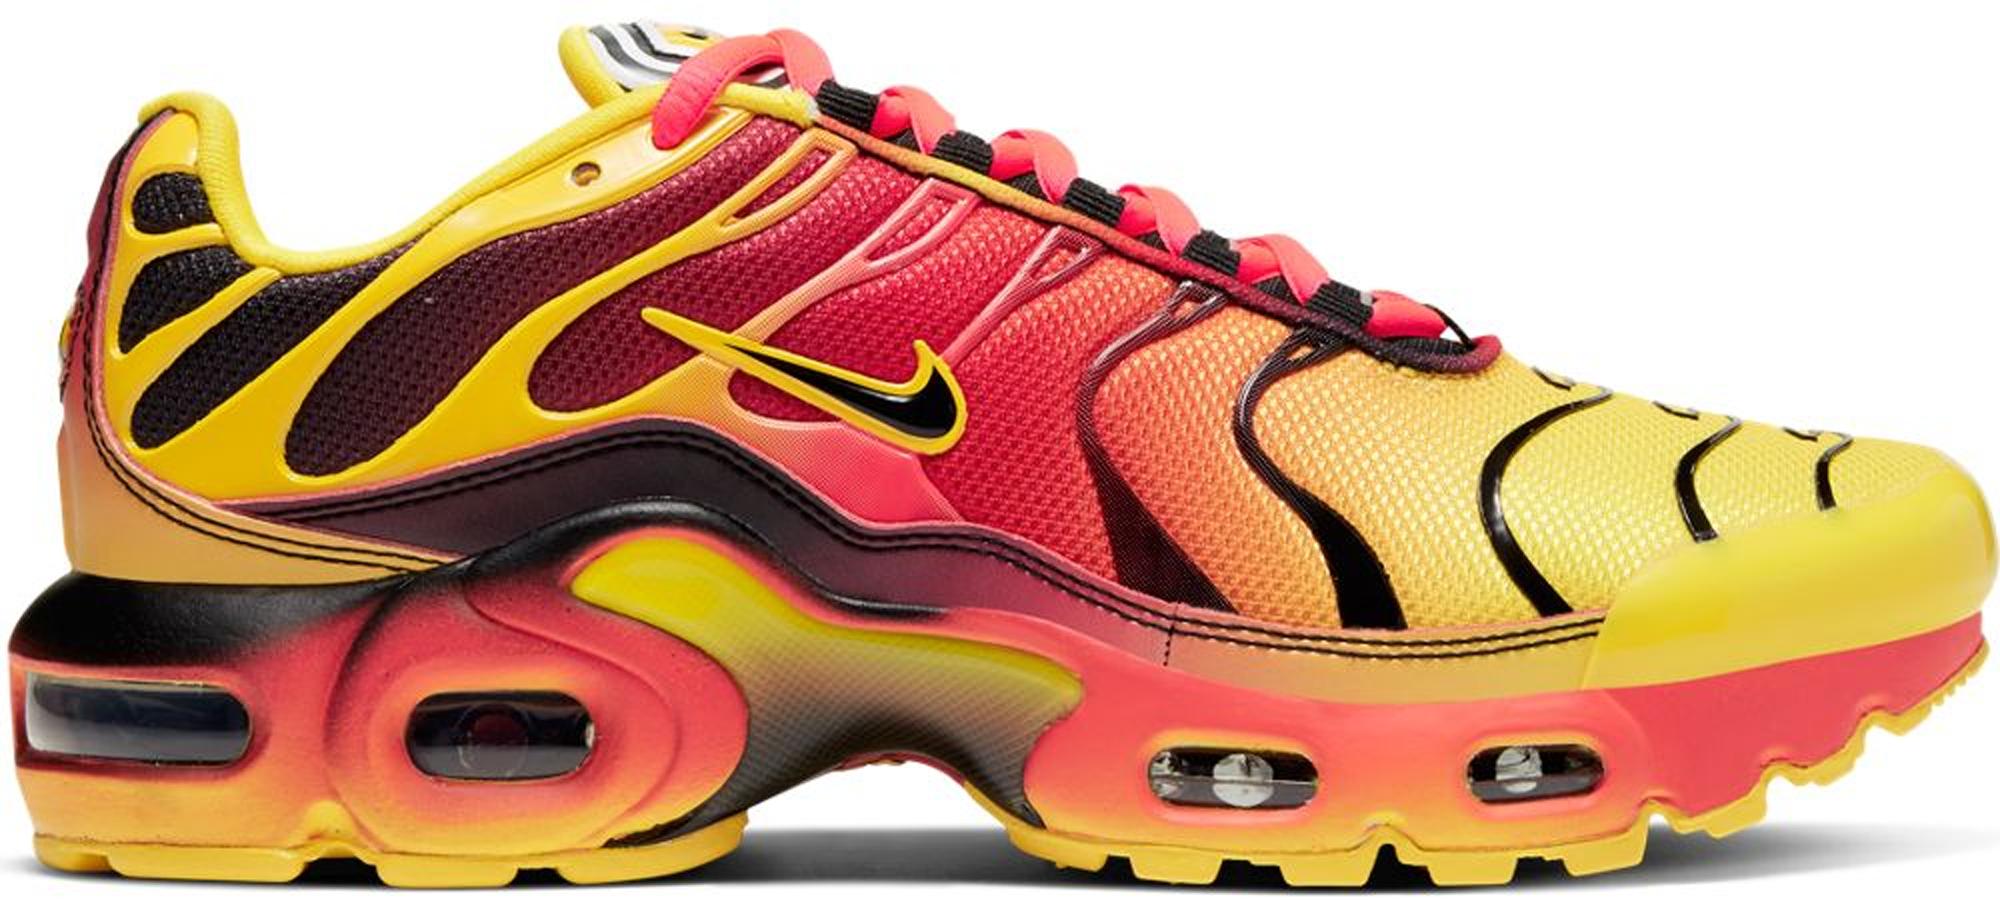 Nike Air Max Plus Fade Chrome Yellow